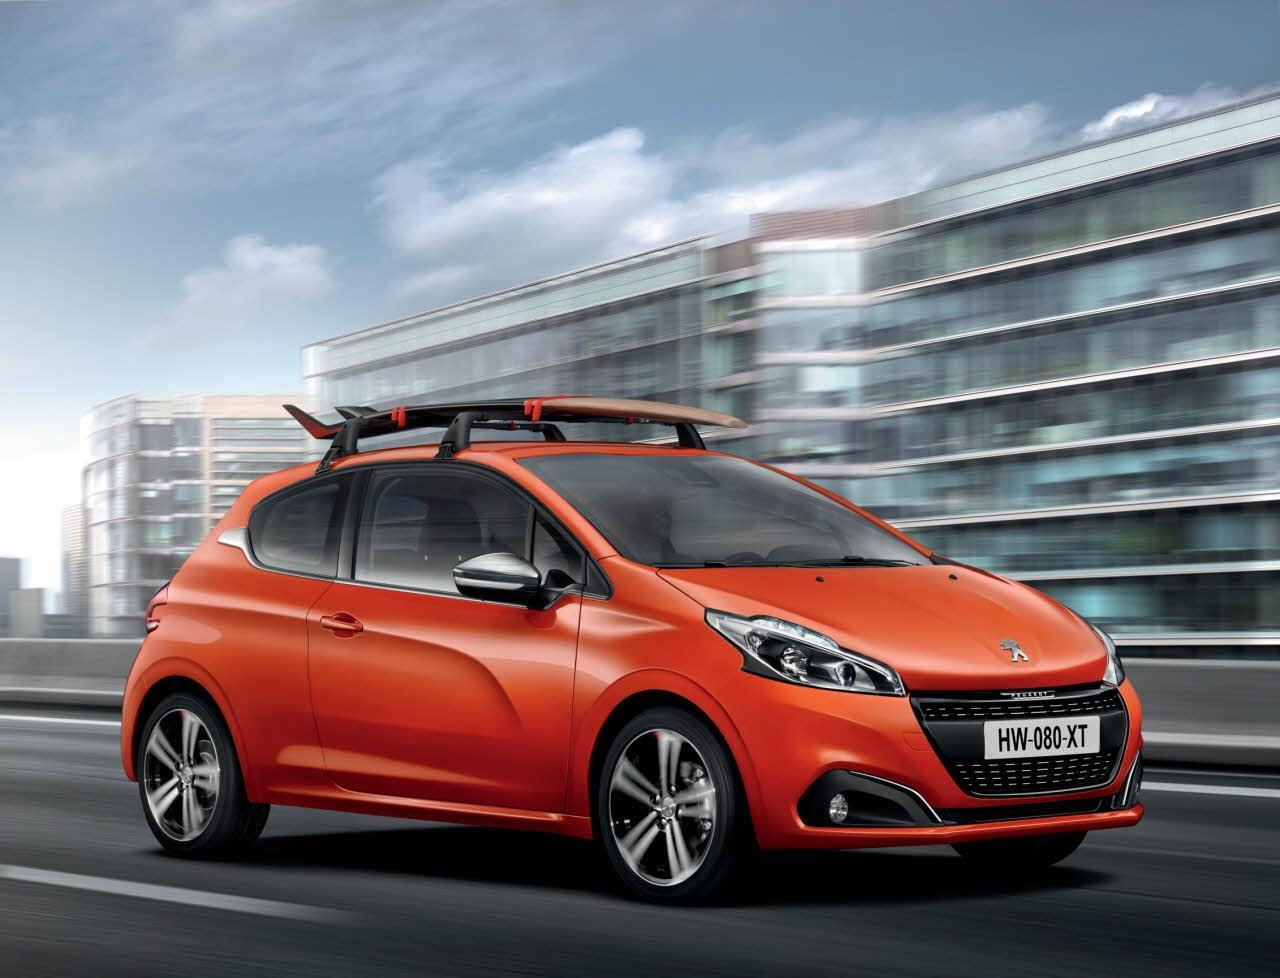 Peugeot%2B208%2Bphoto Σαρώνει στις πωλήσεις η Peugeot Peugeot, Peugeot 208